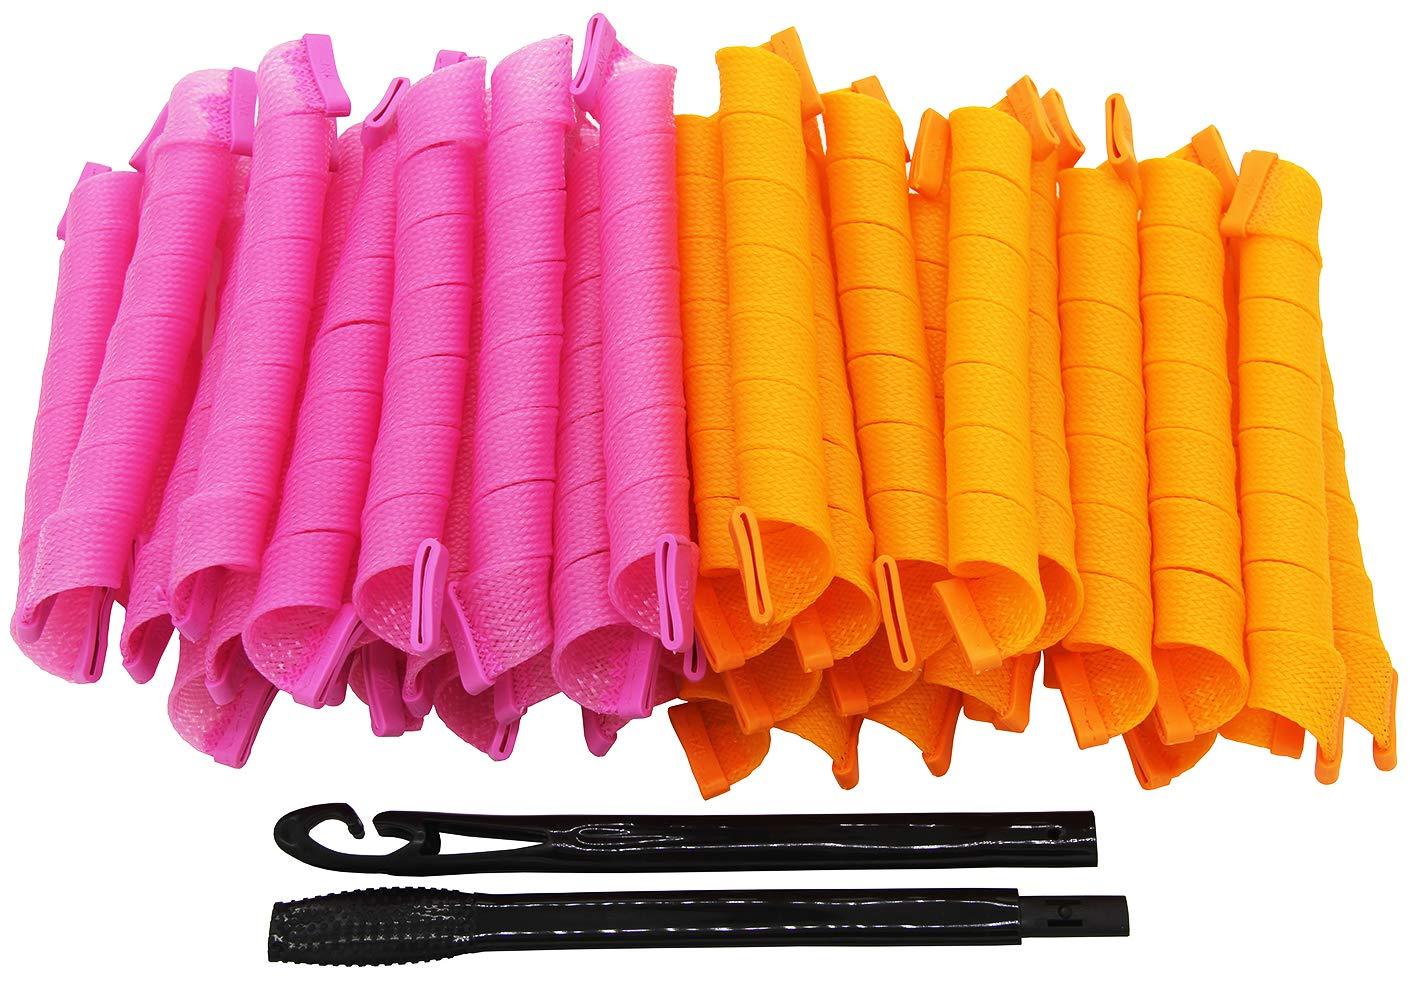 LZLRUN Super Long Spiral Curls Styling Kit - 40pcs & 45cm FFL